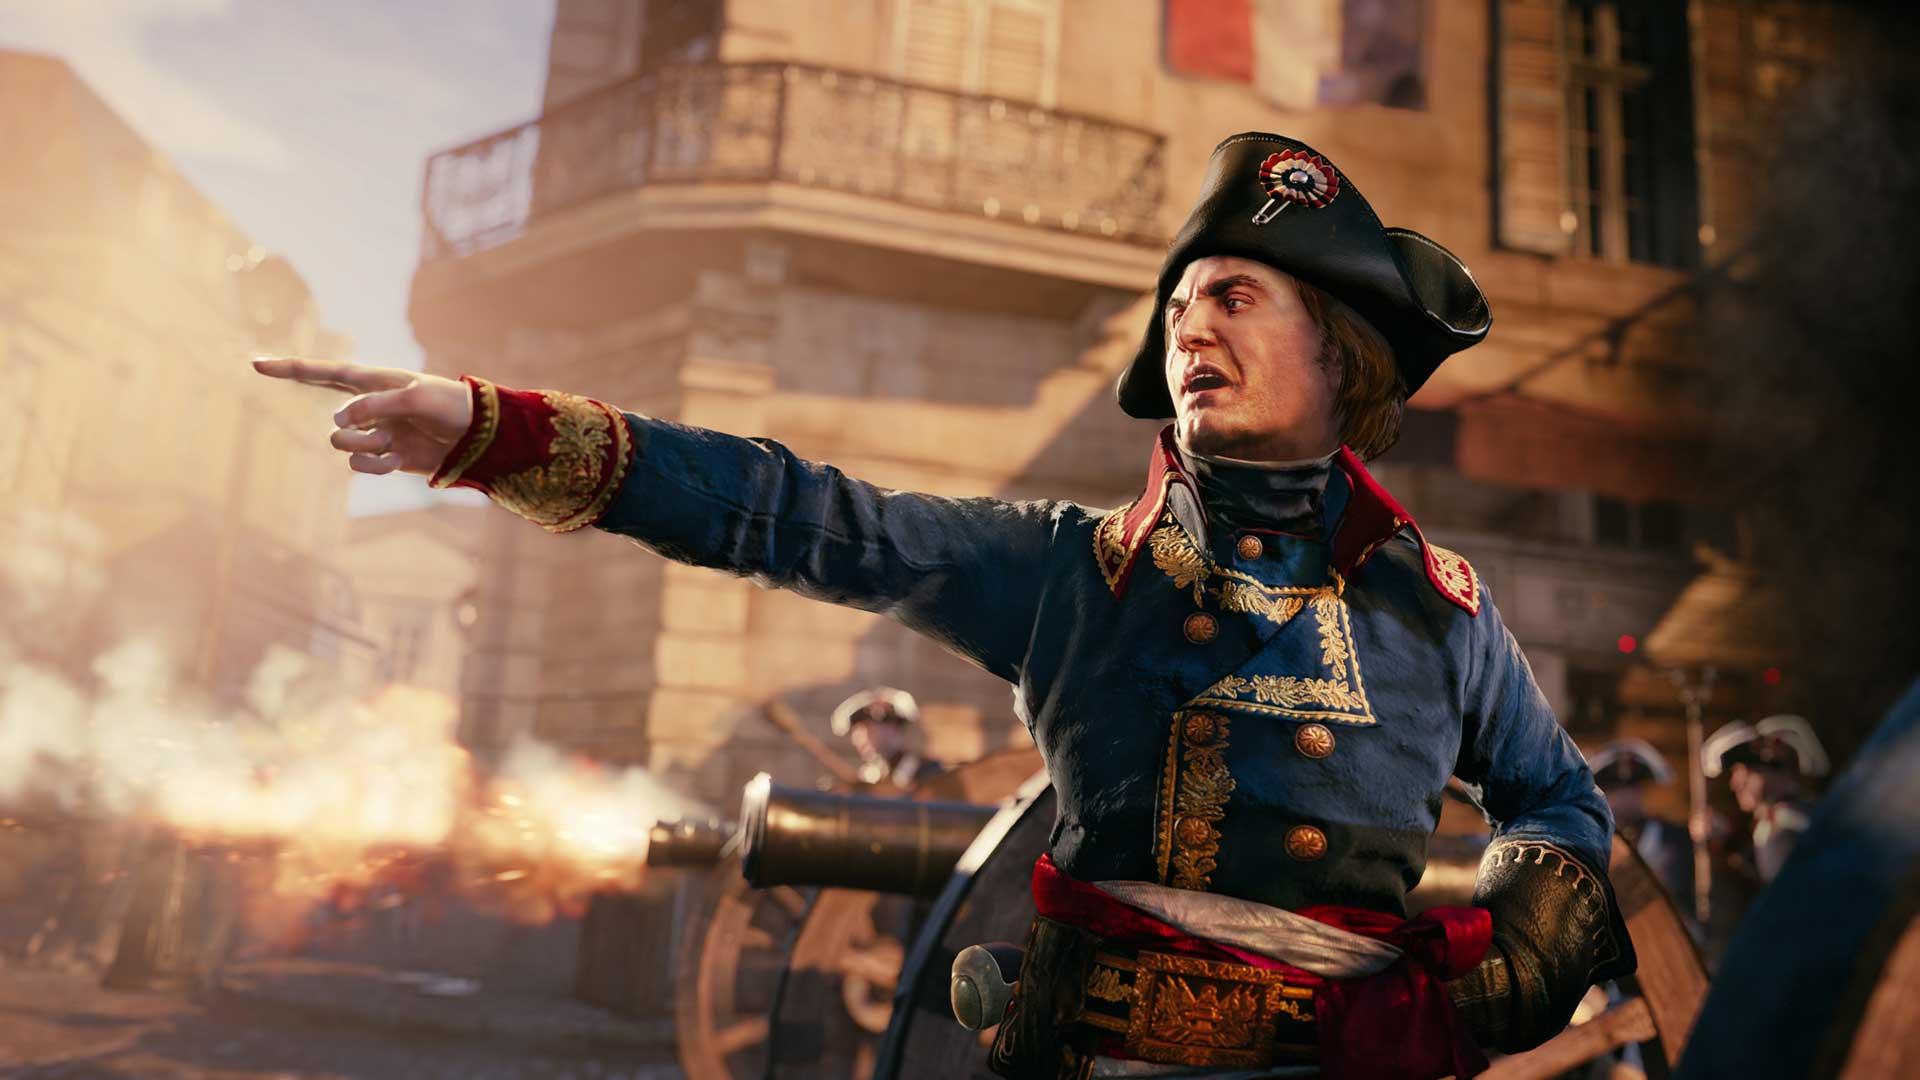 Assassin's Creed: Unity Papel de Parede HD | Plano de Fundo | 1920x1080